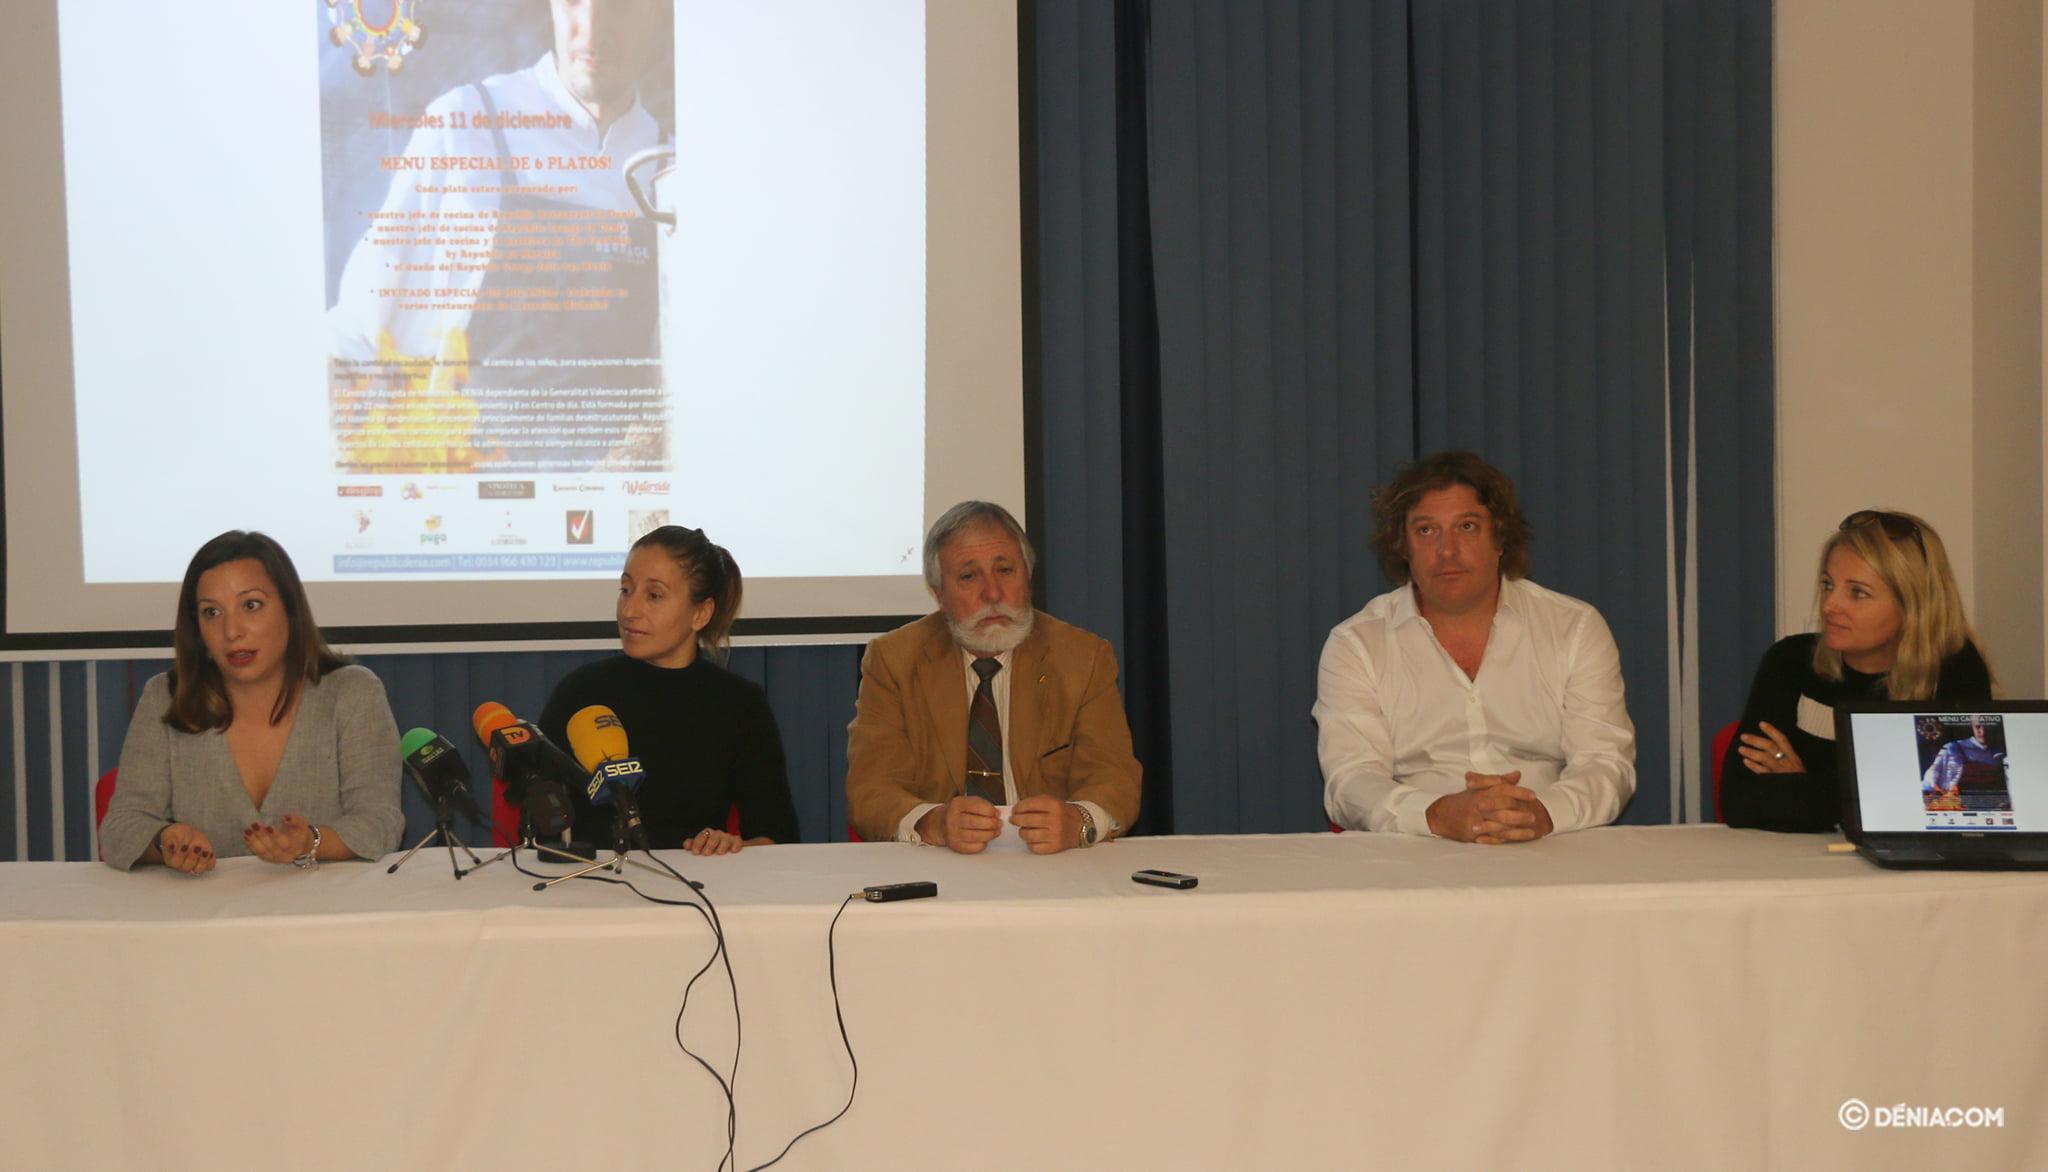 Работники центра Les Rotes поблагодарили мероприятие